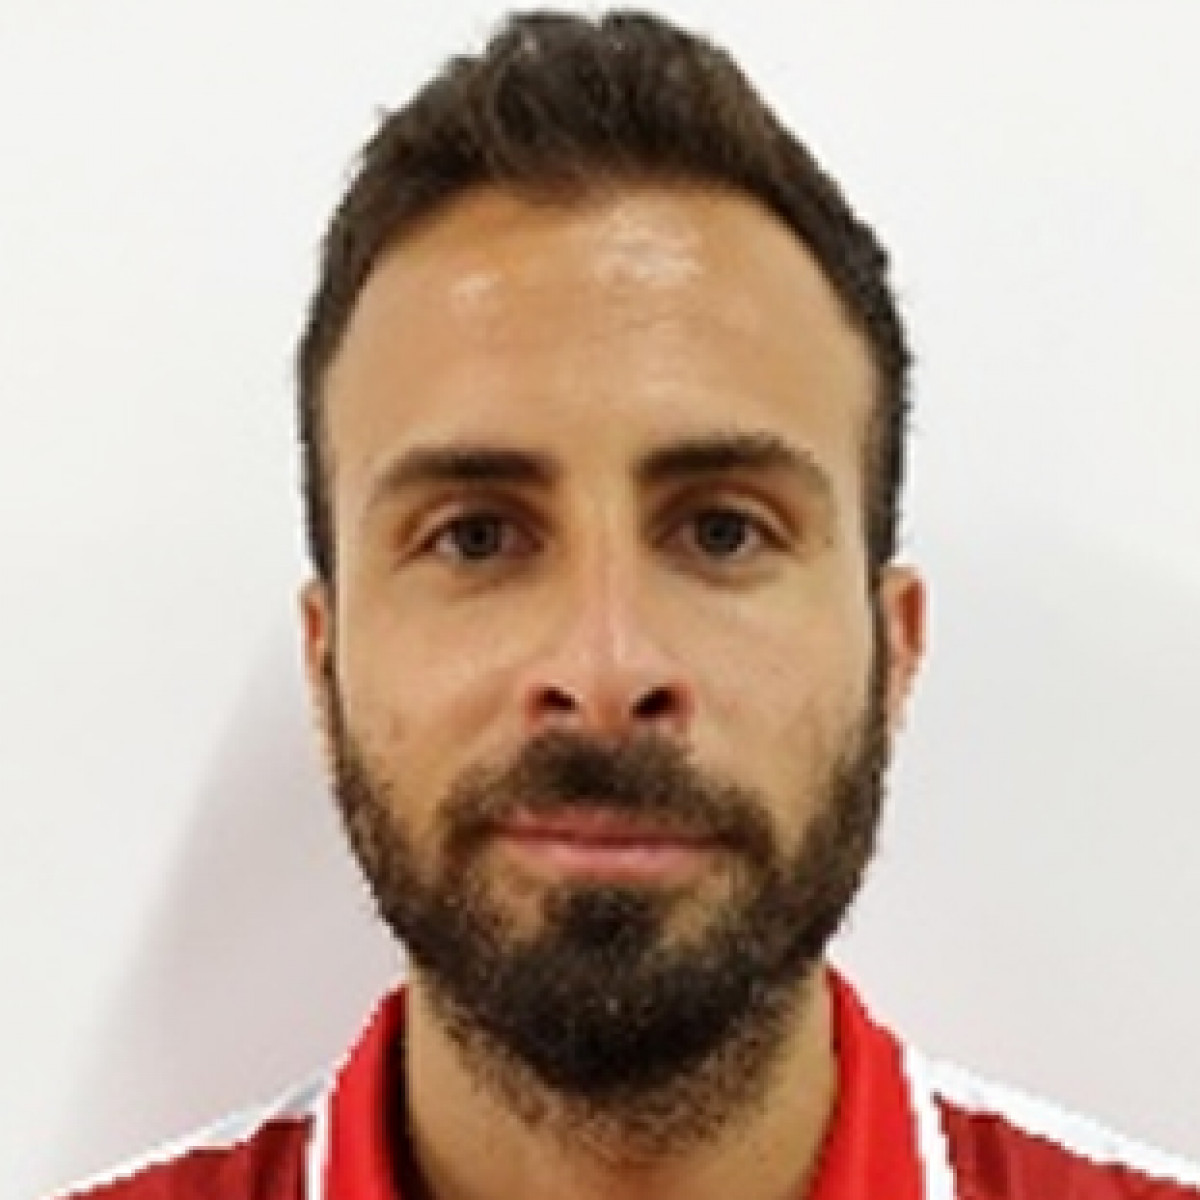 Juan Jose Coello